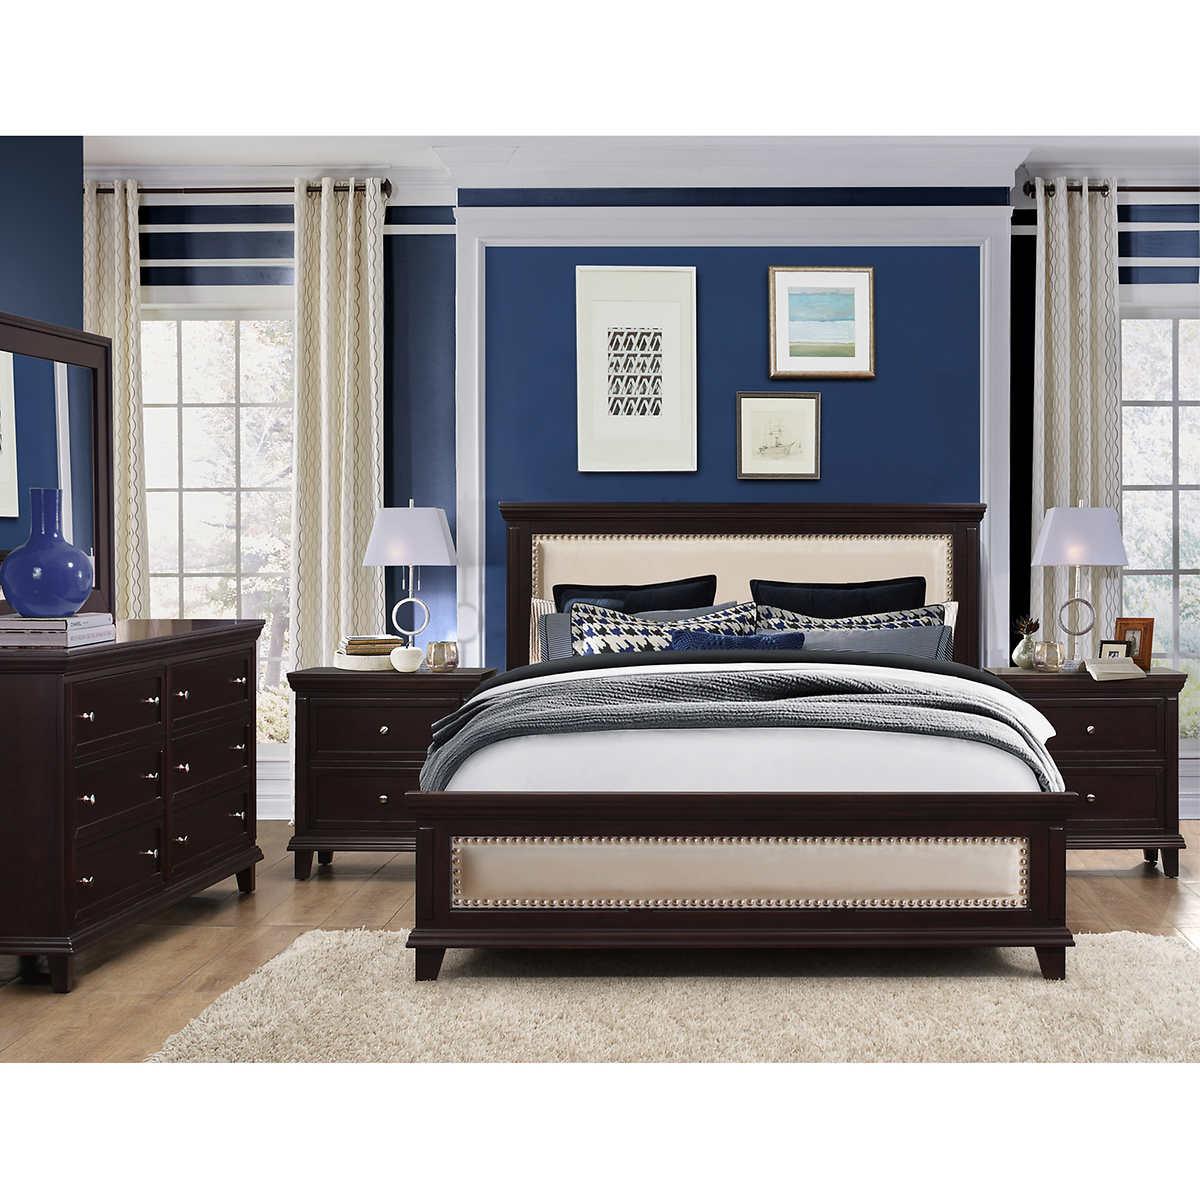 cal king bedroom sets  costco - johanna piece cal king bedroom set